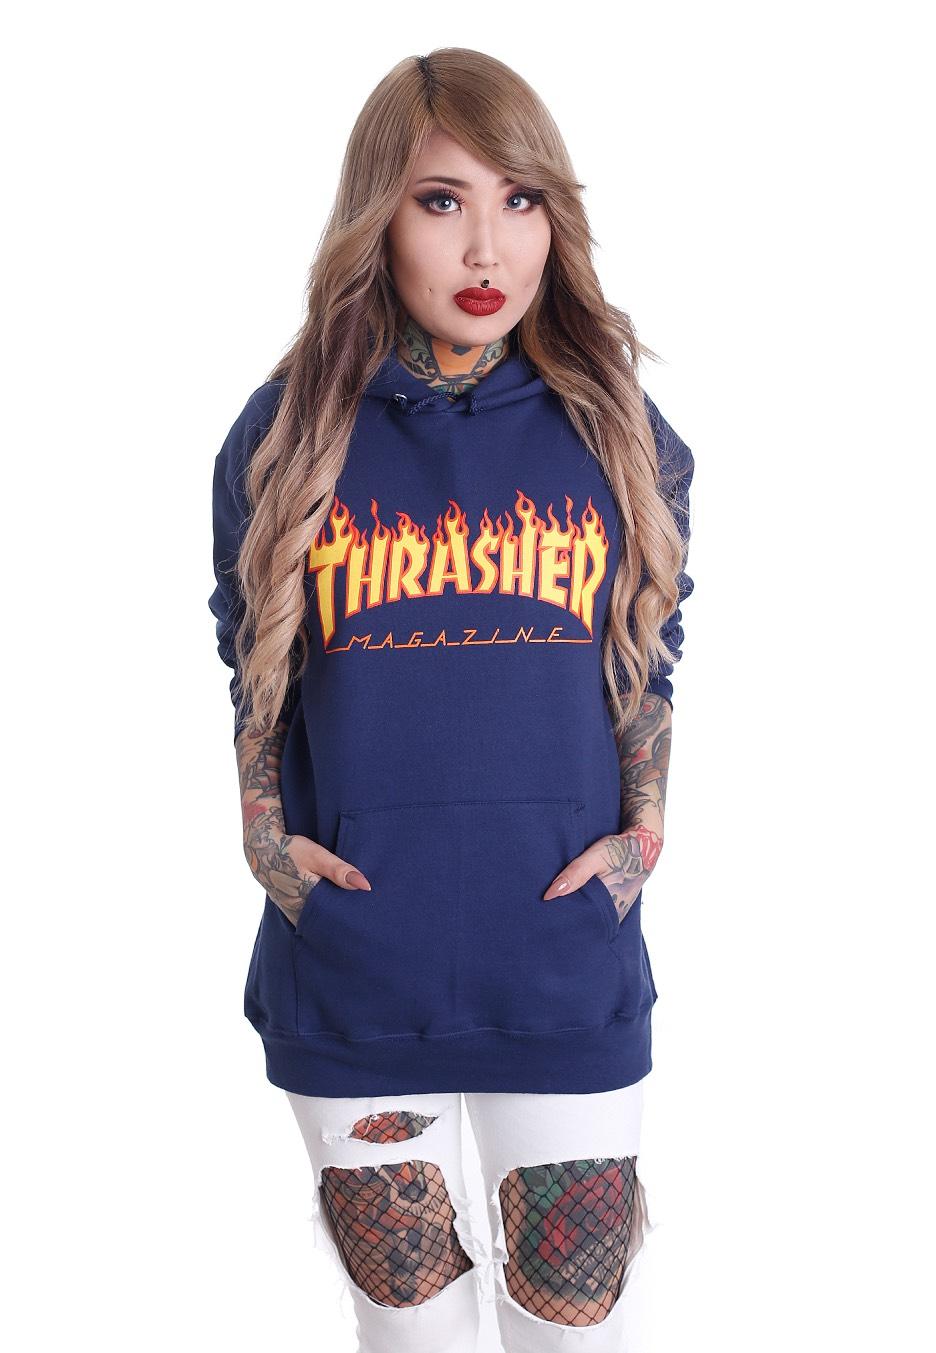 a8098883546f Thrasher - Thrasher Flame Navy - Hoodie - Streetwear Shop - Impericon.com UK